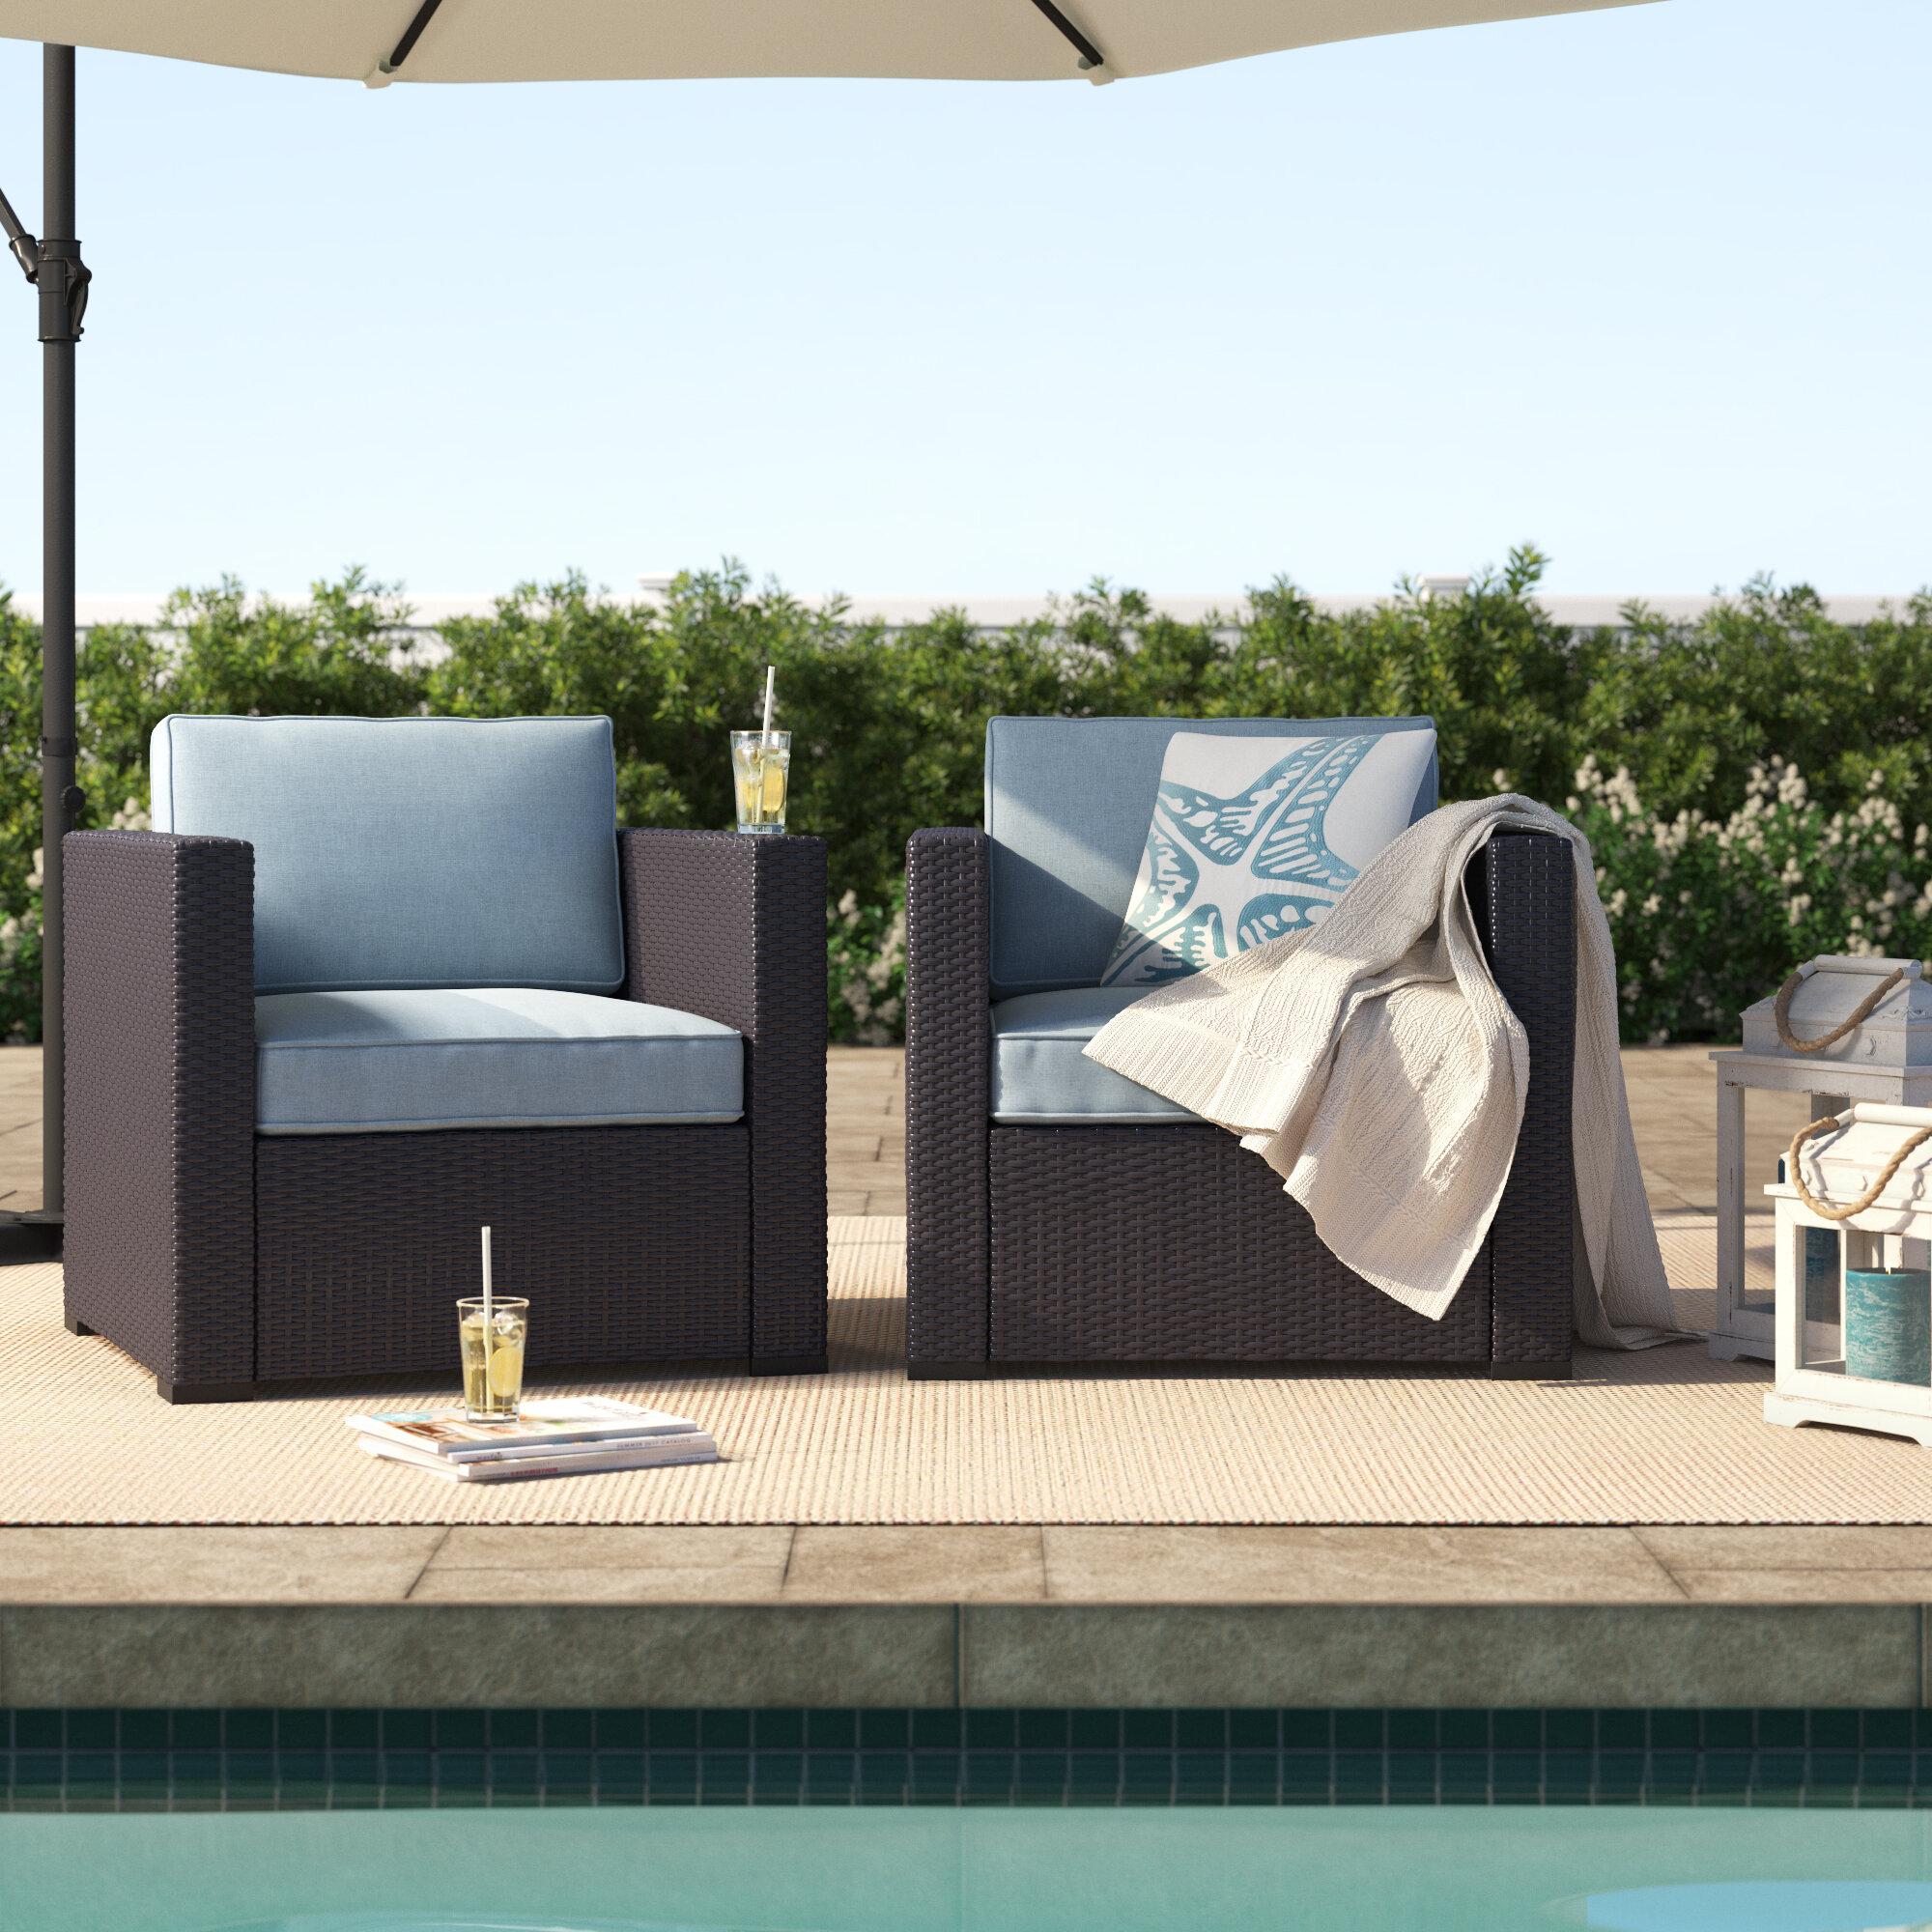 Superb Oversized Wicker Chair Wayfair Home Interior And Landscaping Ymoonbapapsignezvosmurscom